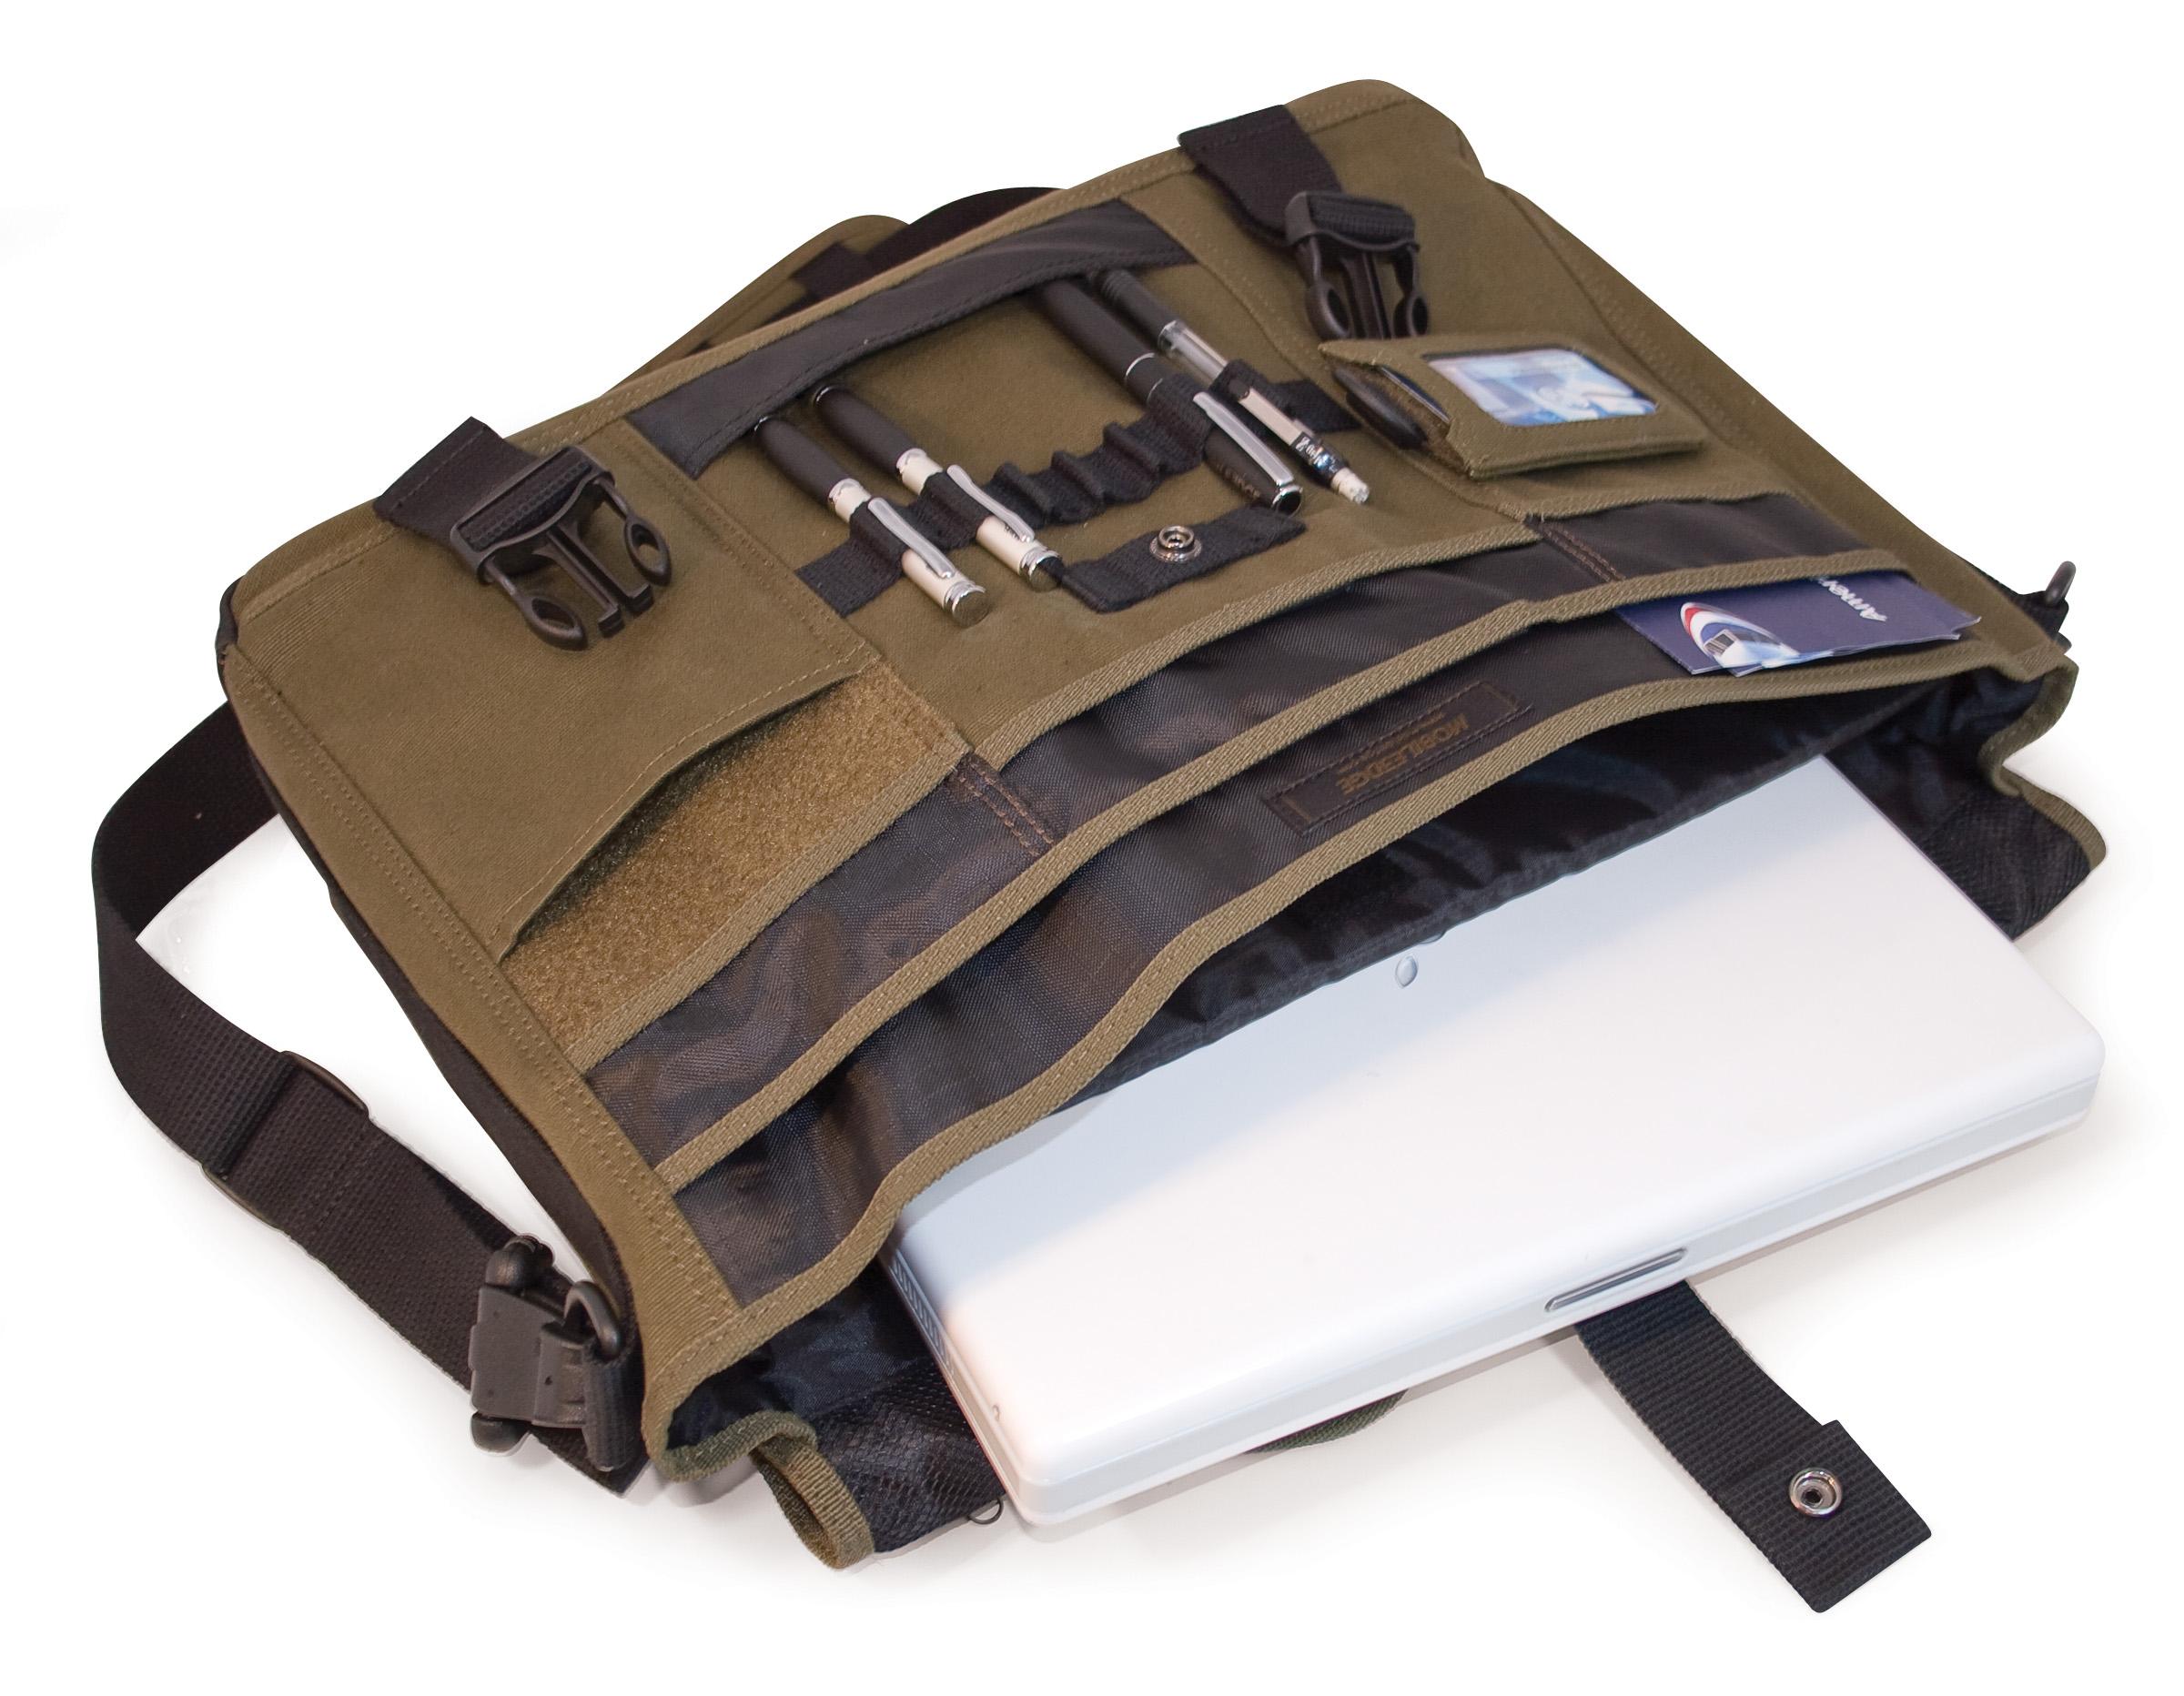 Laptop bags office depot - Eco Friendly Cotton Canvas Material